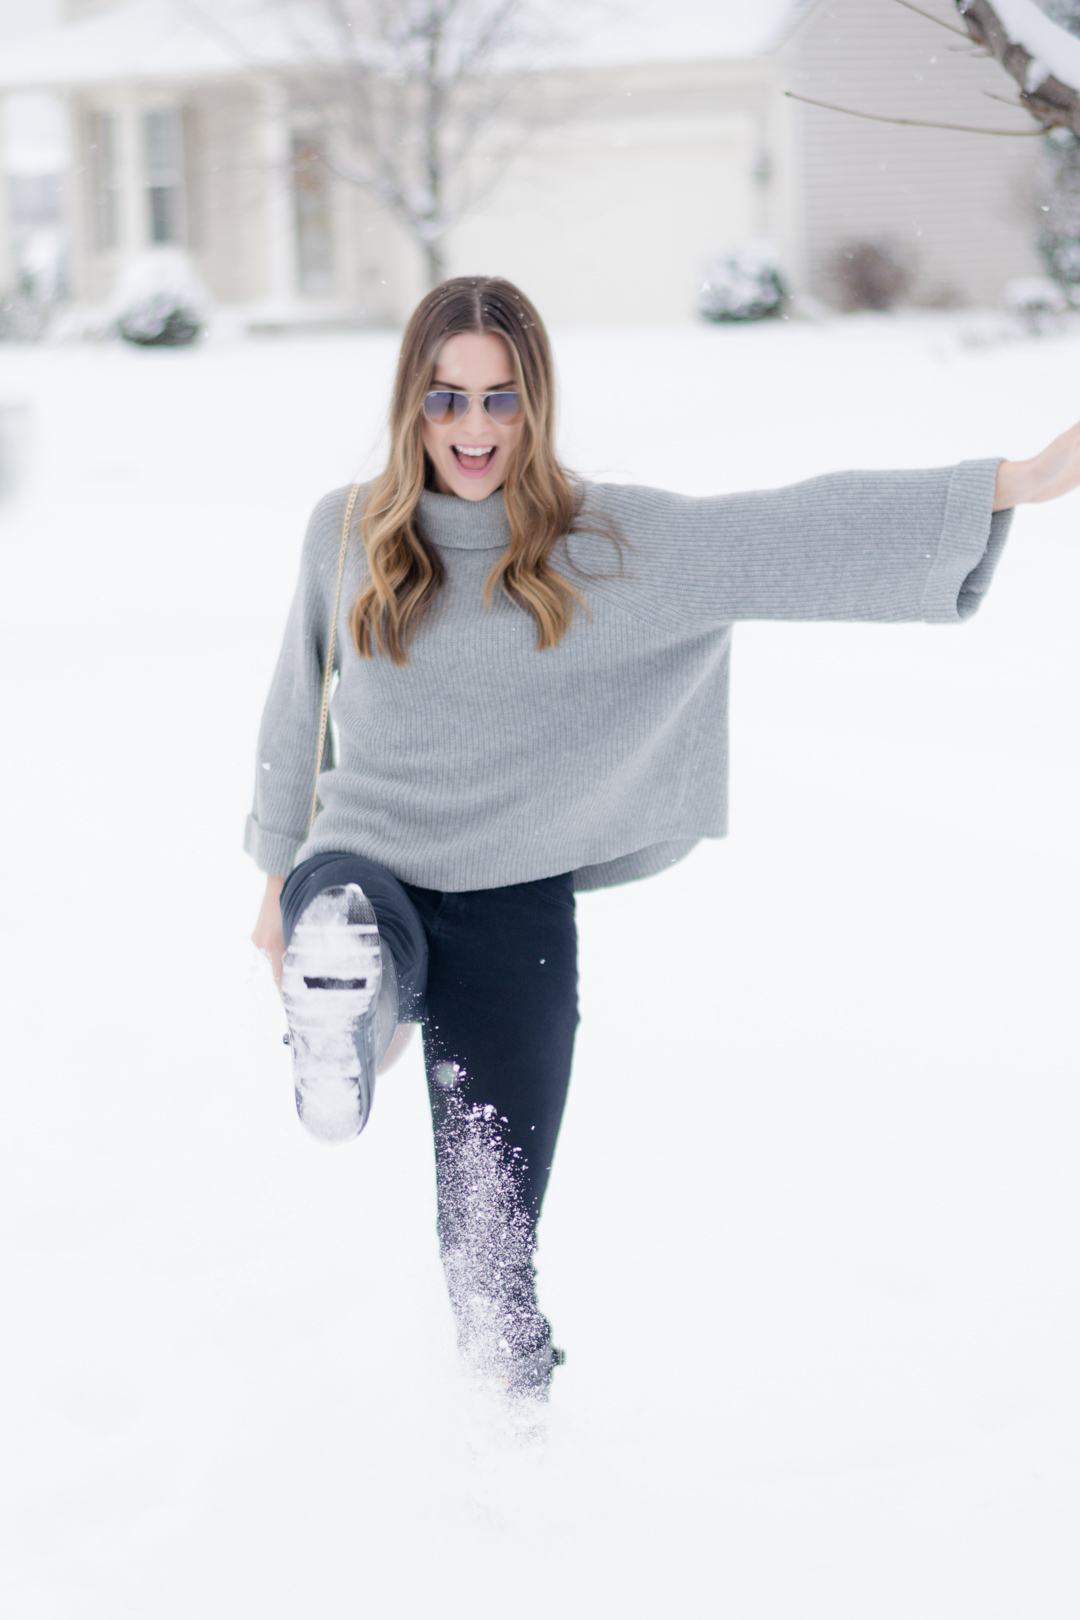 bloggiversary, blog anniversary, shop ditto, #endlesseyewear, neutral winter look, chloe saddle bag dupe